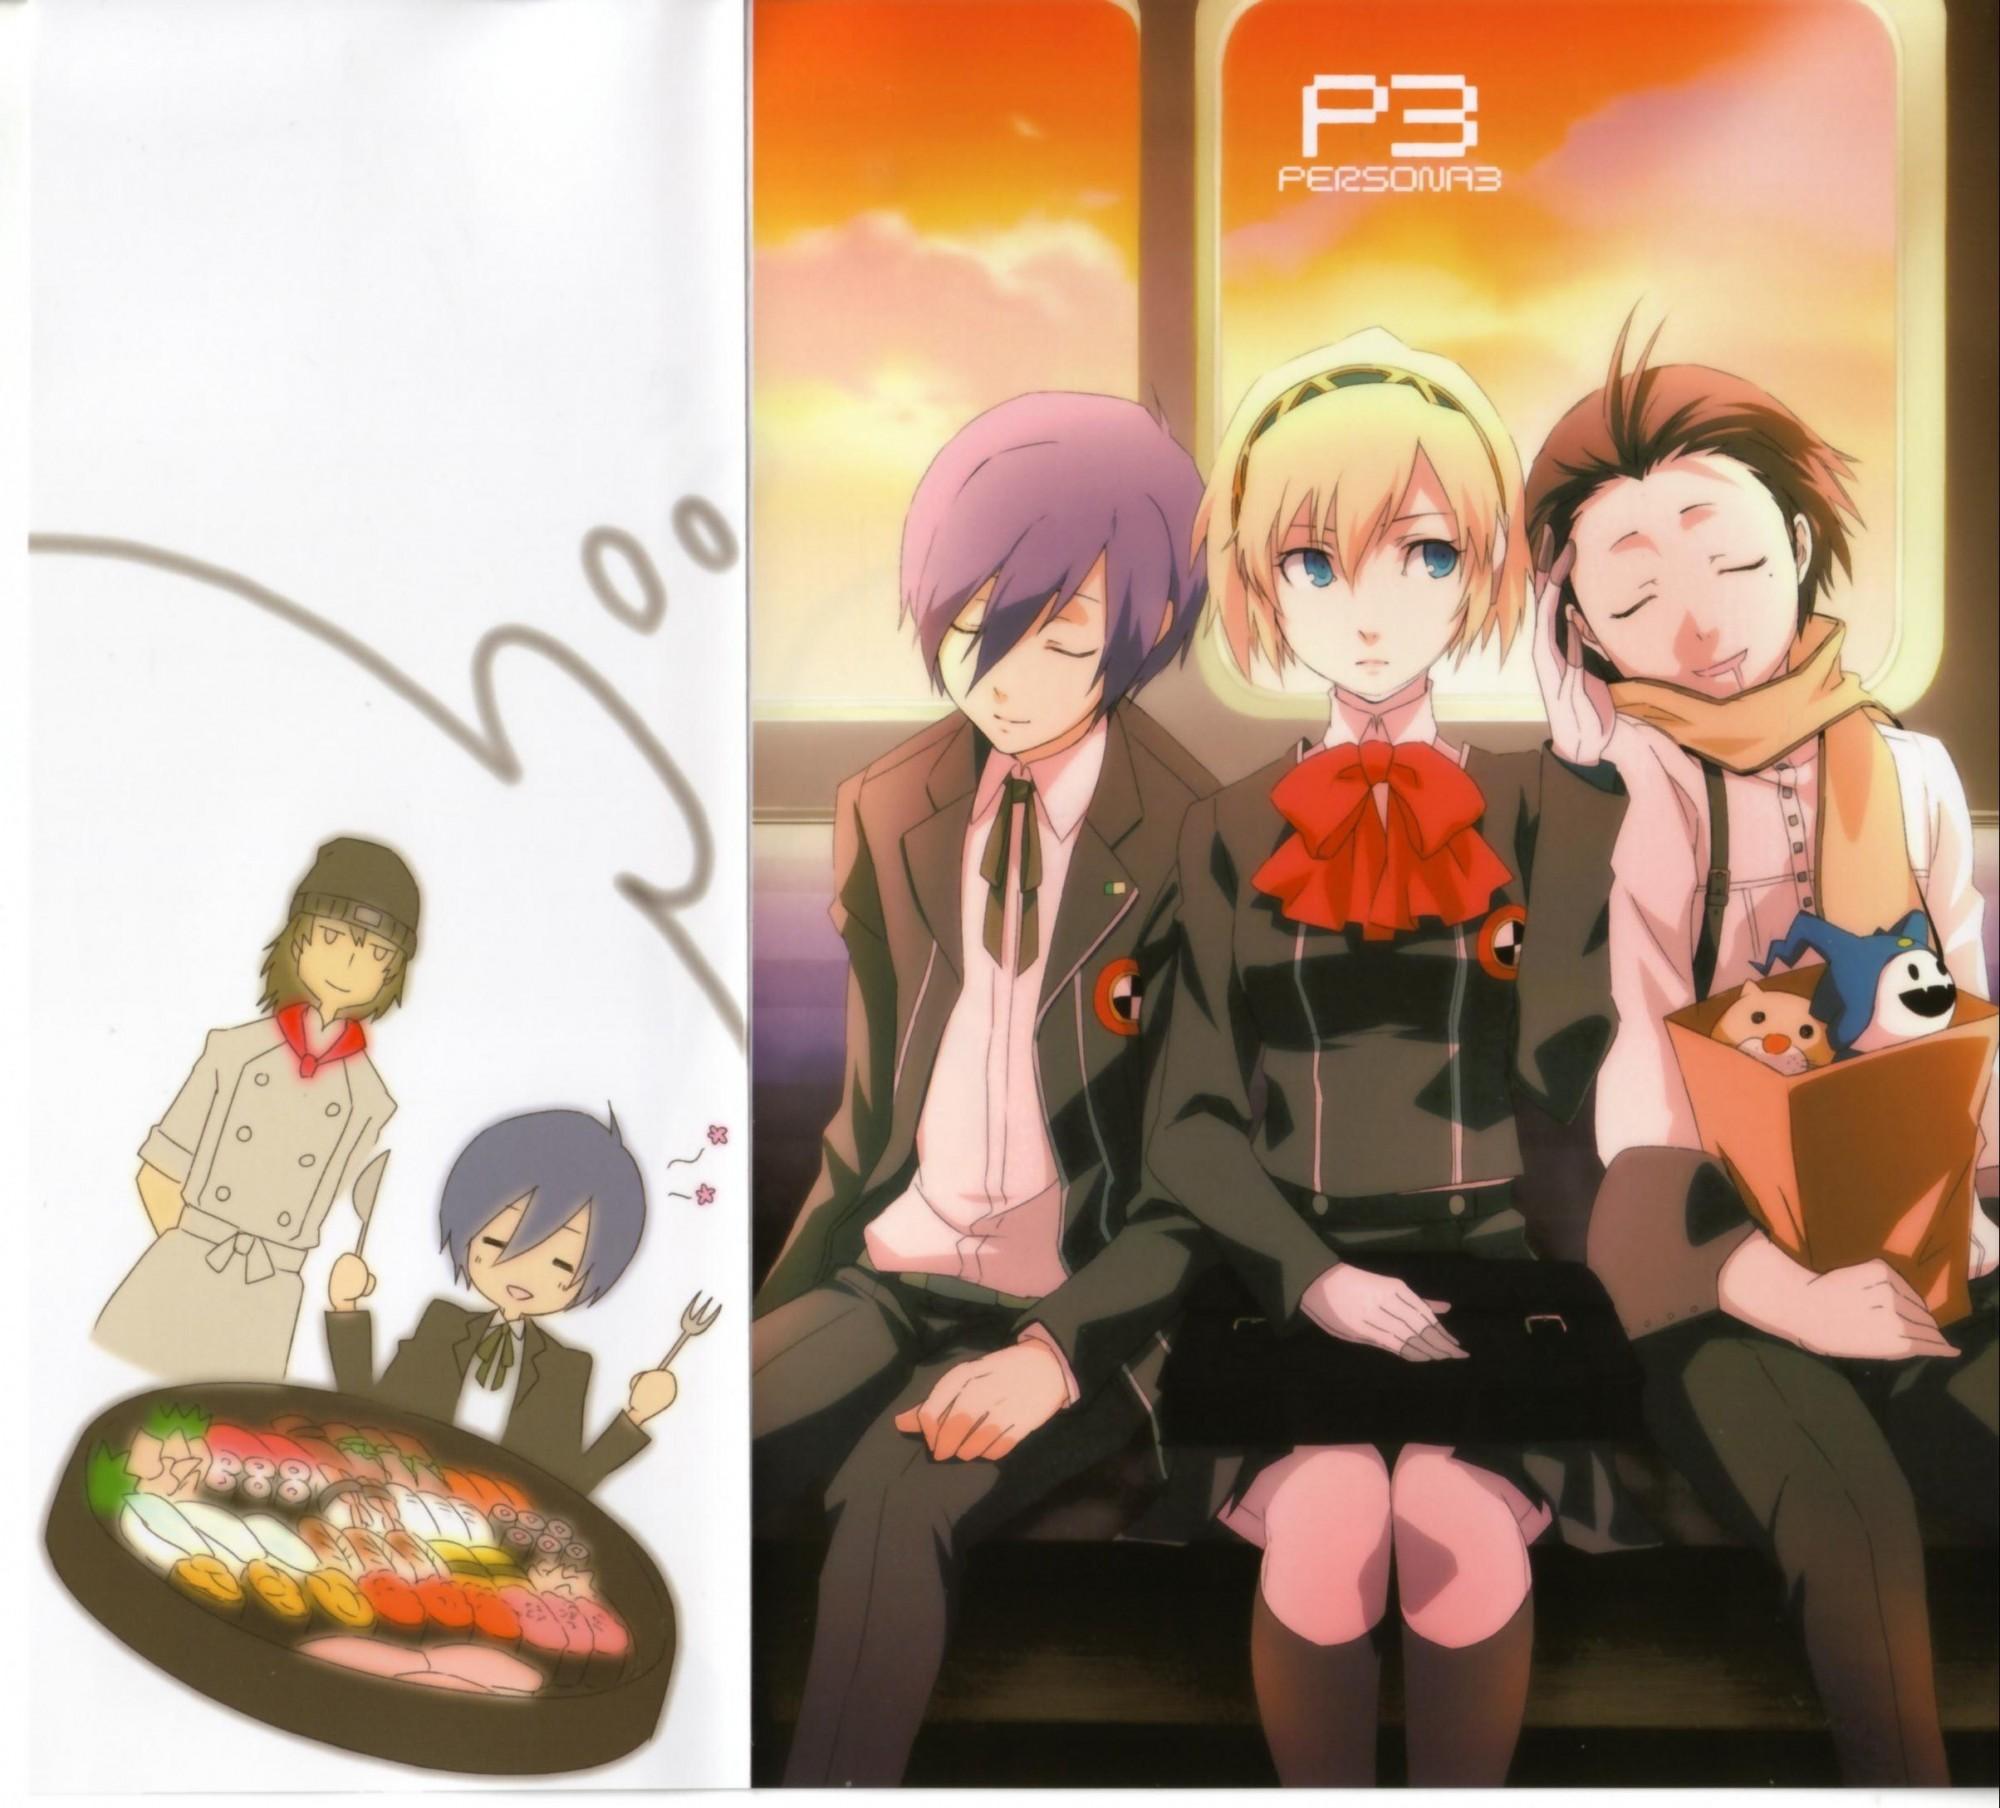 Tags: Shin Megami Tensei: PERSONA 3, Aegis, Jack Frost (Shin Megami